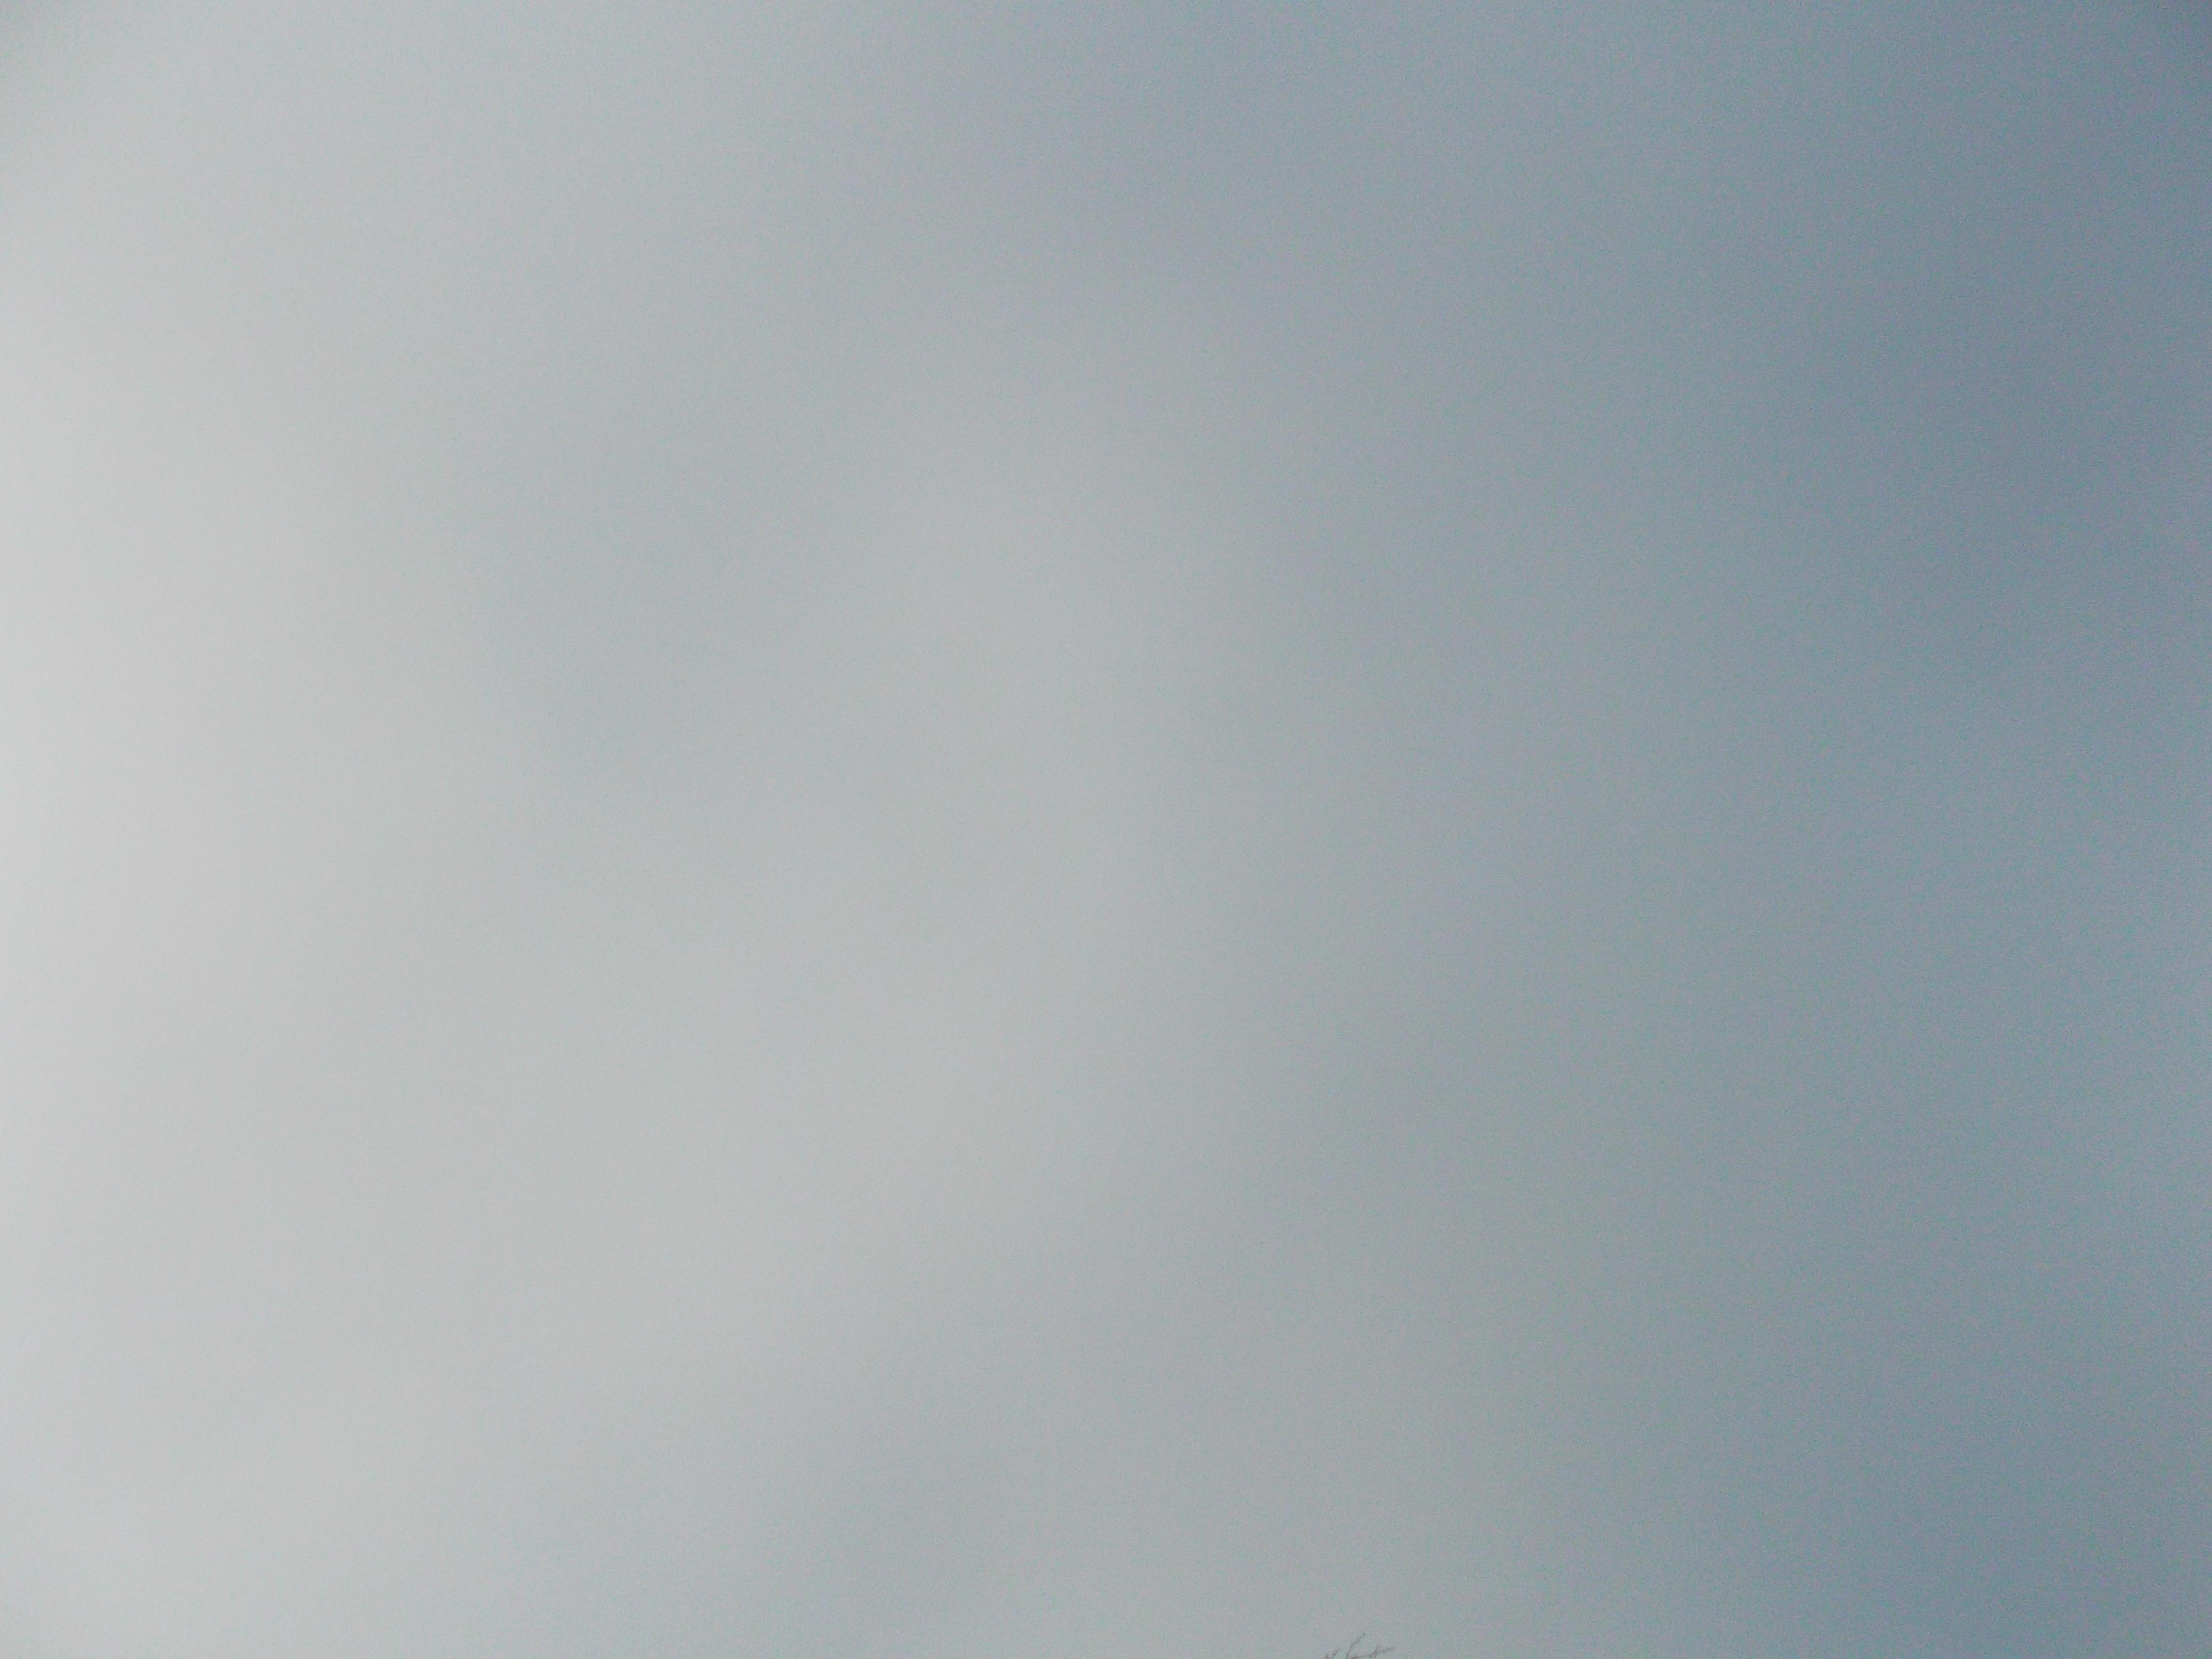 2013-01-25 Longitude -0.371 Latitude 49.182 Altitude 13 Heure 14h05